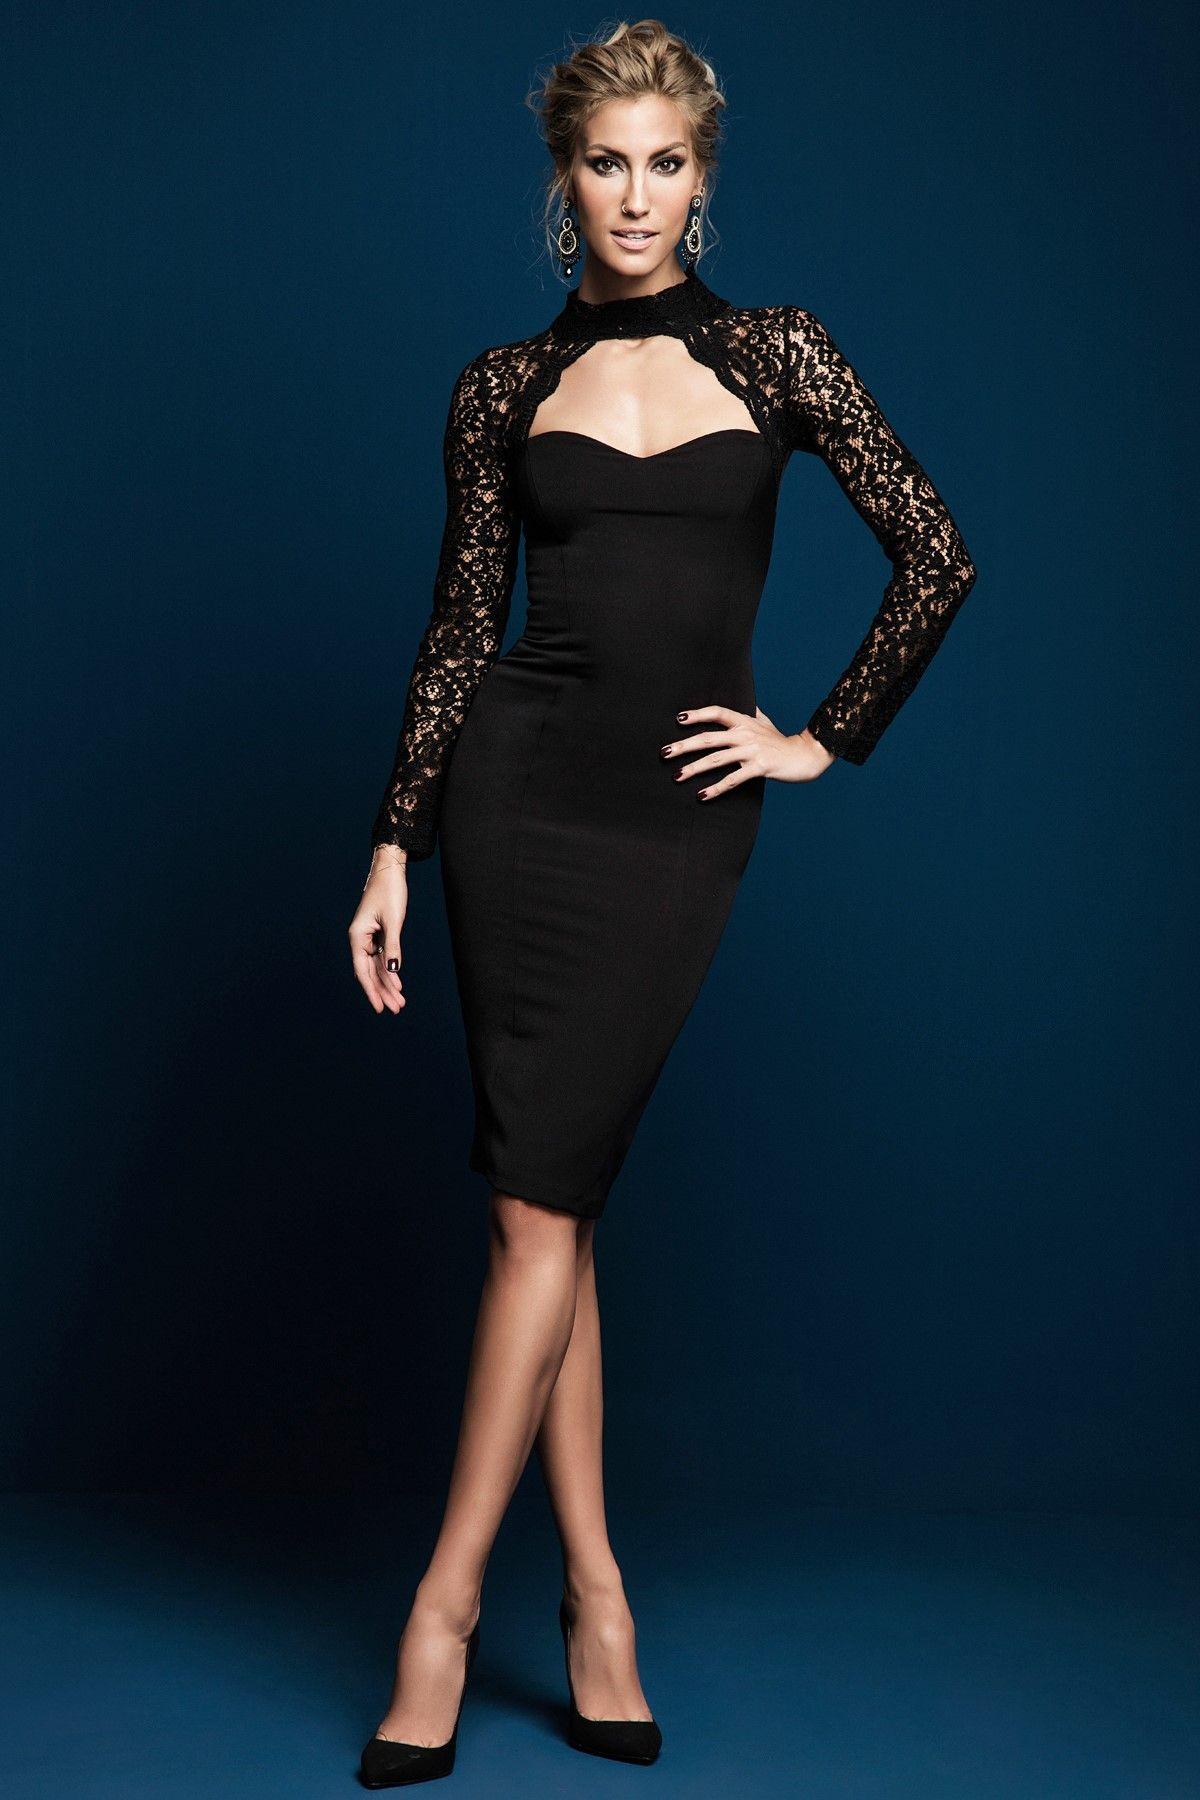 Dantel Kol Detayli Siyah Elbise Mlwaw16fz0165 Milla By Trendyol Trendyol Siyah Elbise Elbise The Dress